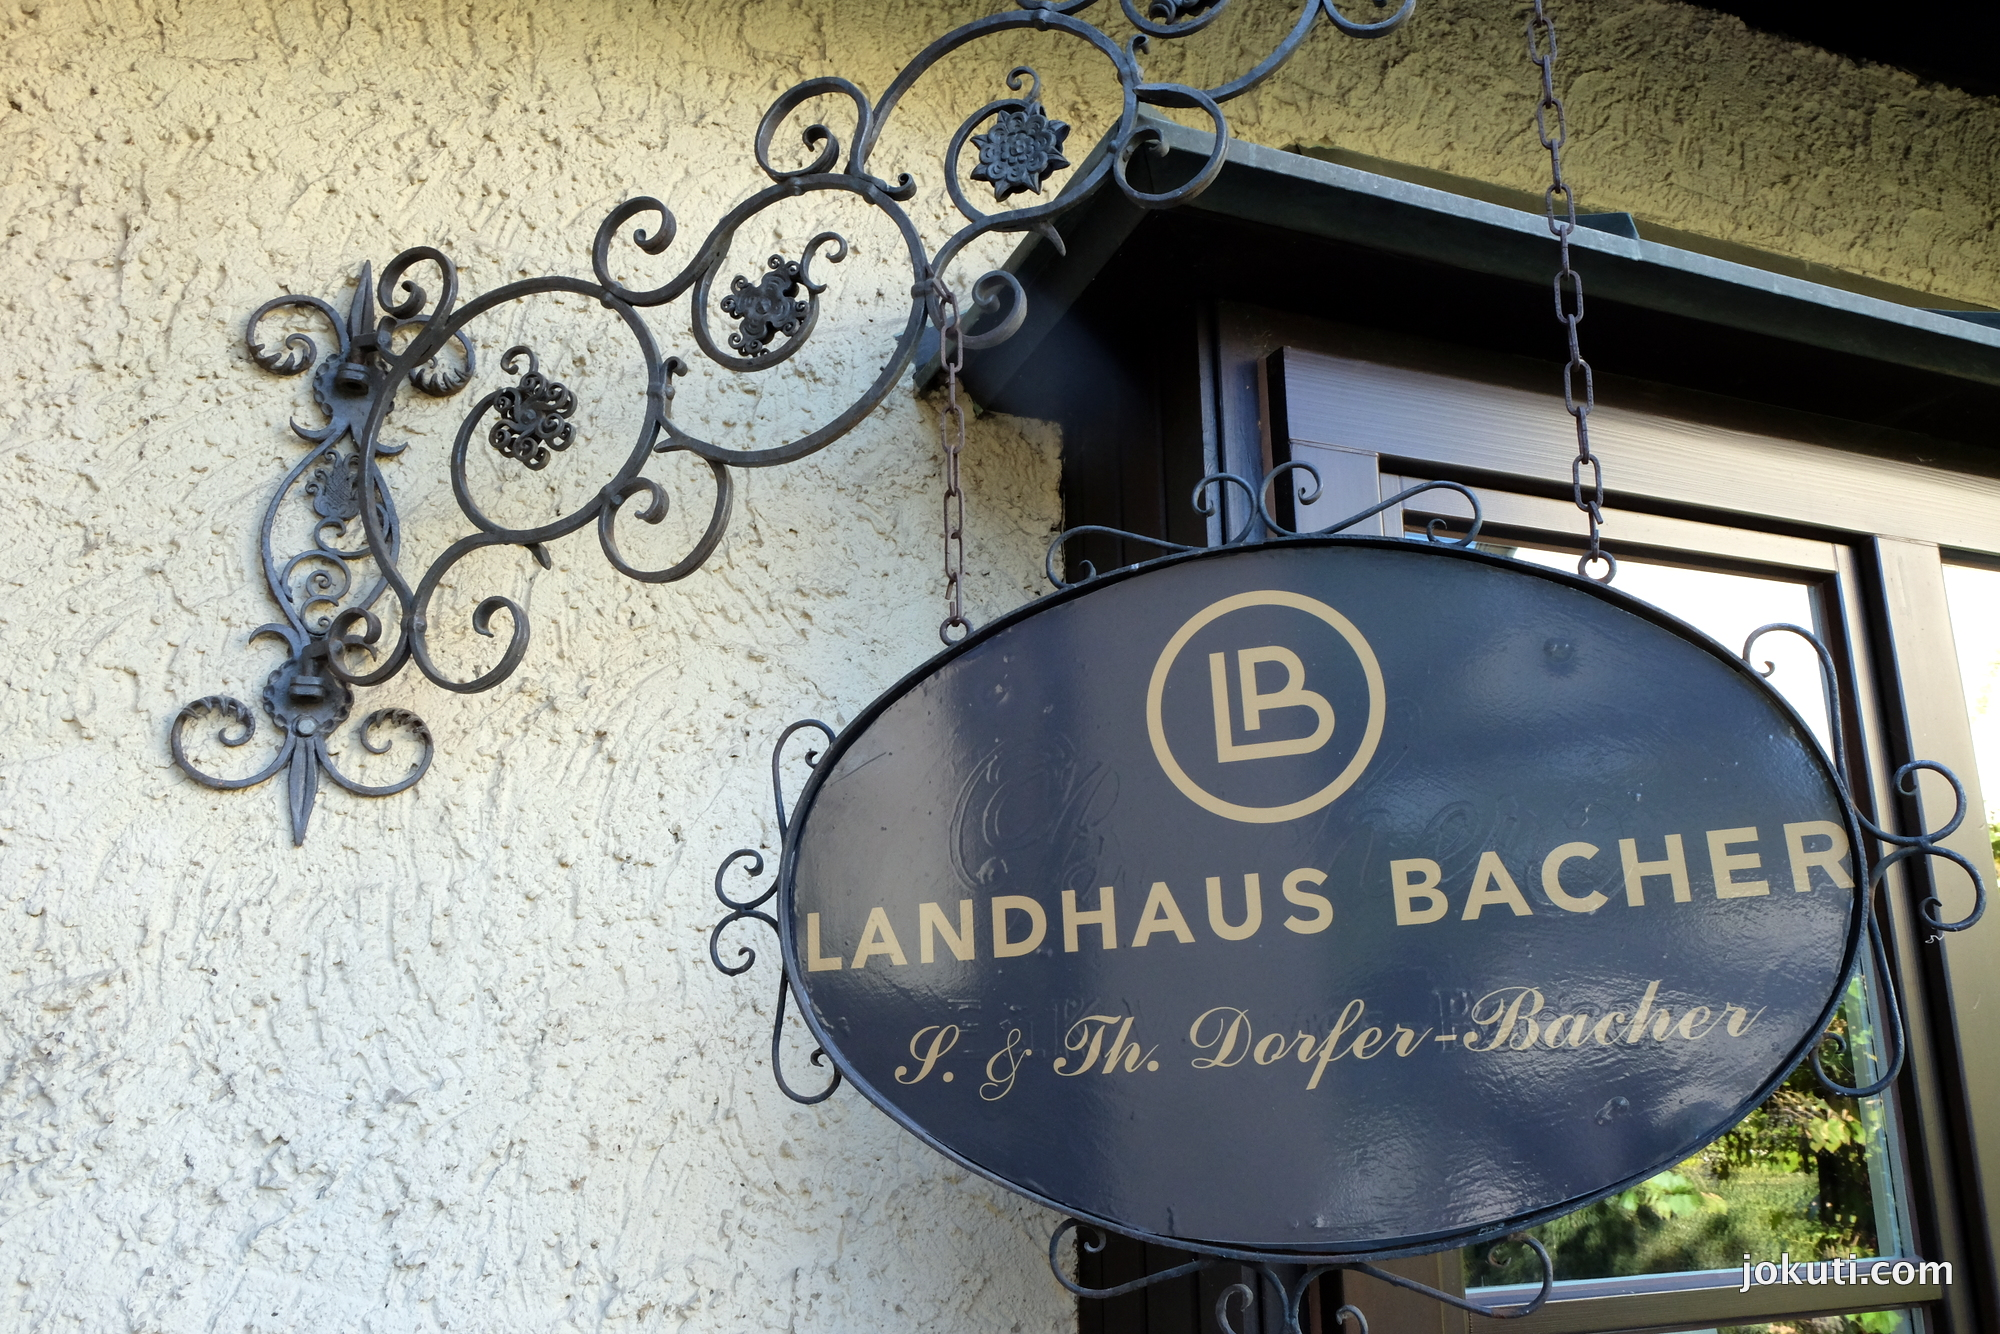 dscf7723_ausztria_austria_vilagevo_jokuti_landhaus_bacher_dorfer_mautern_wachau_reitbauer_restaurant.jpg